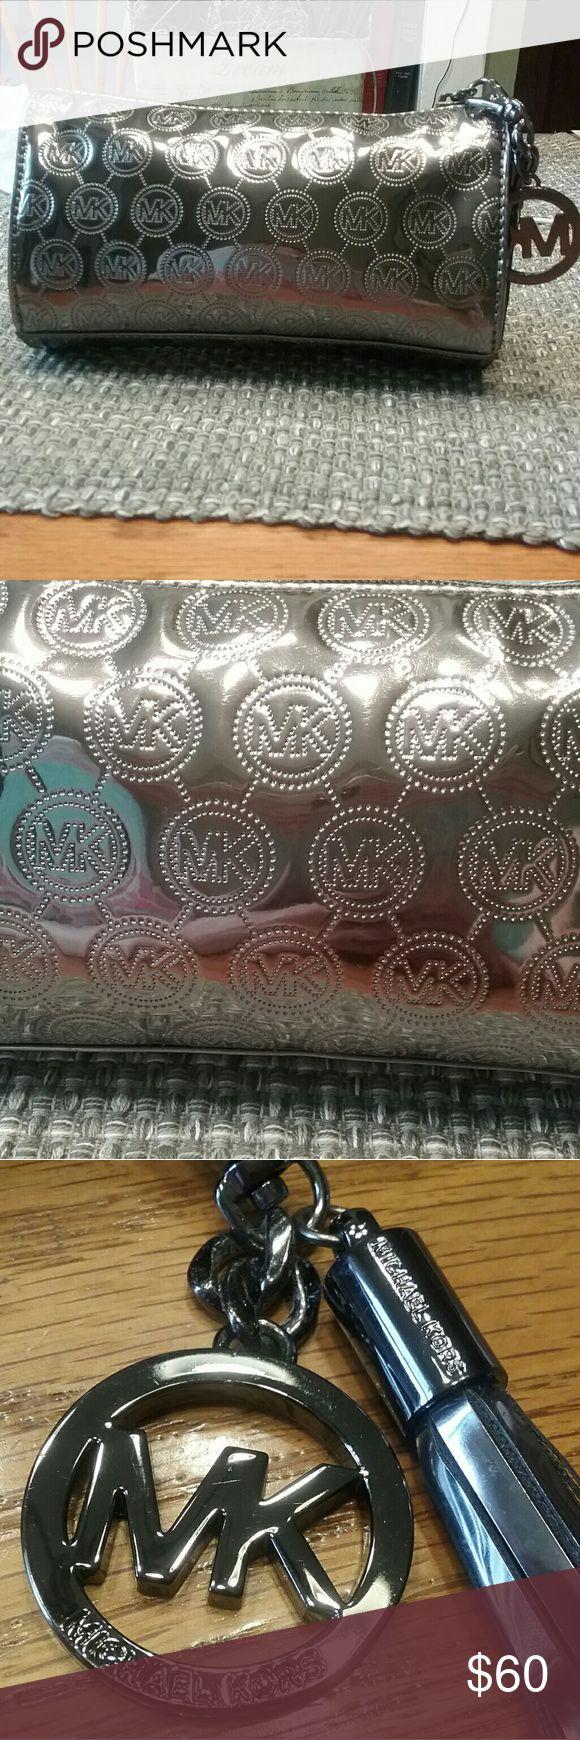 Michael kors silver metallic makeup bag brand new Brand new without tags Michael Kors Bags Cosmetic Bags & Cases